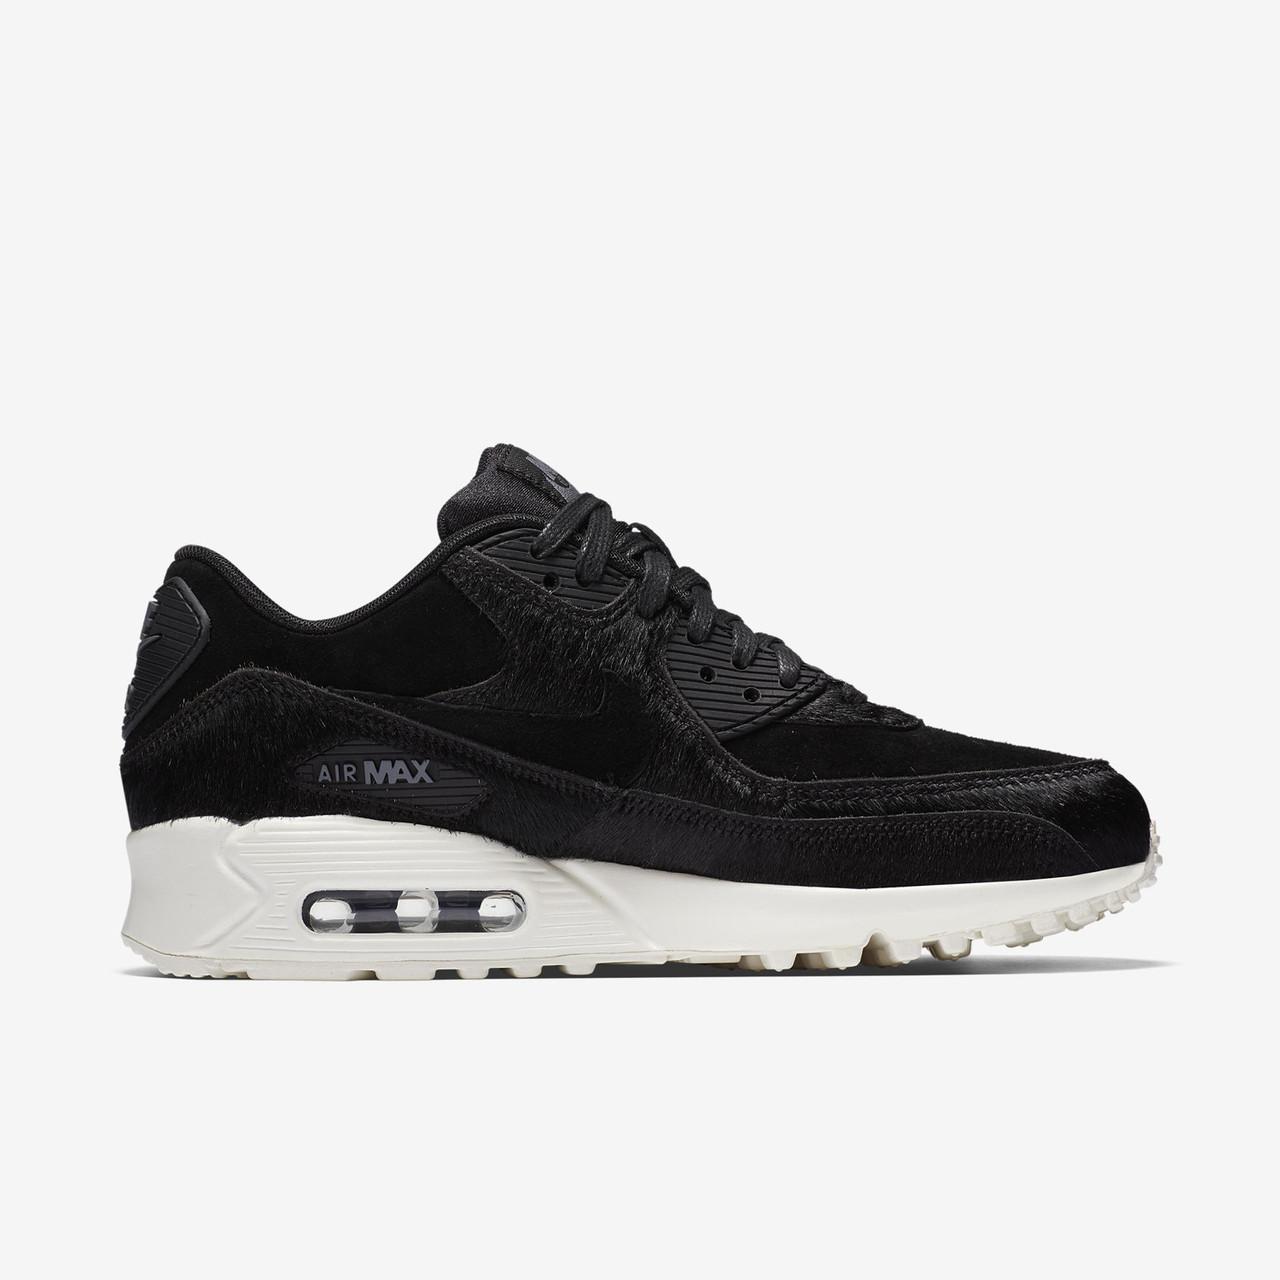 6da7c76c Оригинальные кроссовки Nike Air Max 90 LX Black/Dark Grey - Sport-Sneakers -